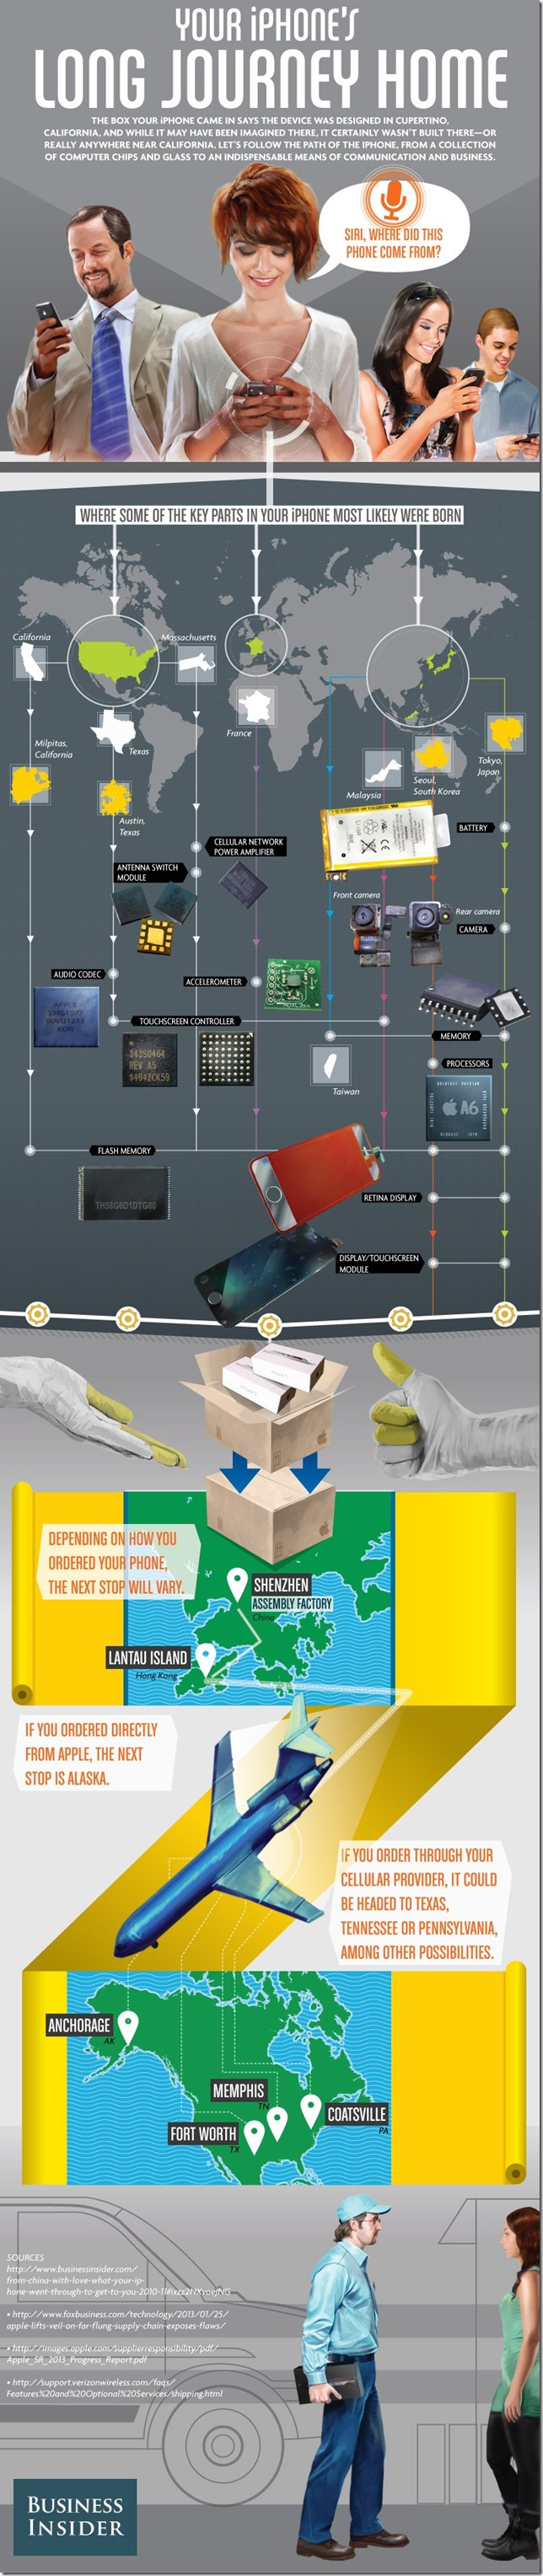 iphone process